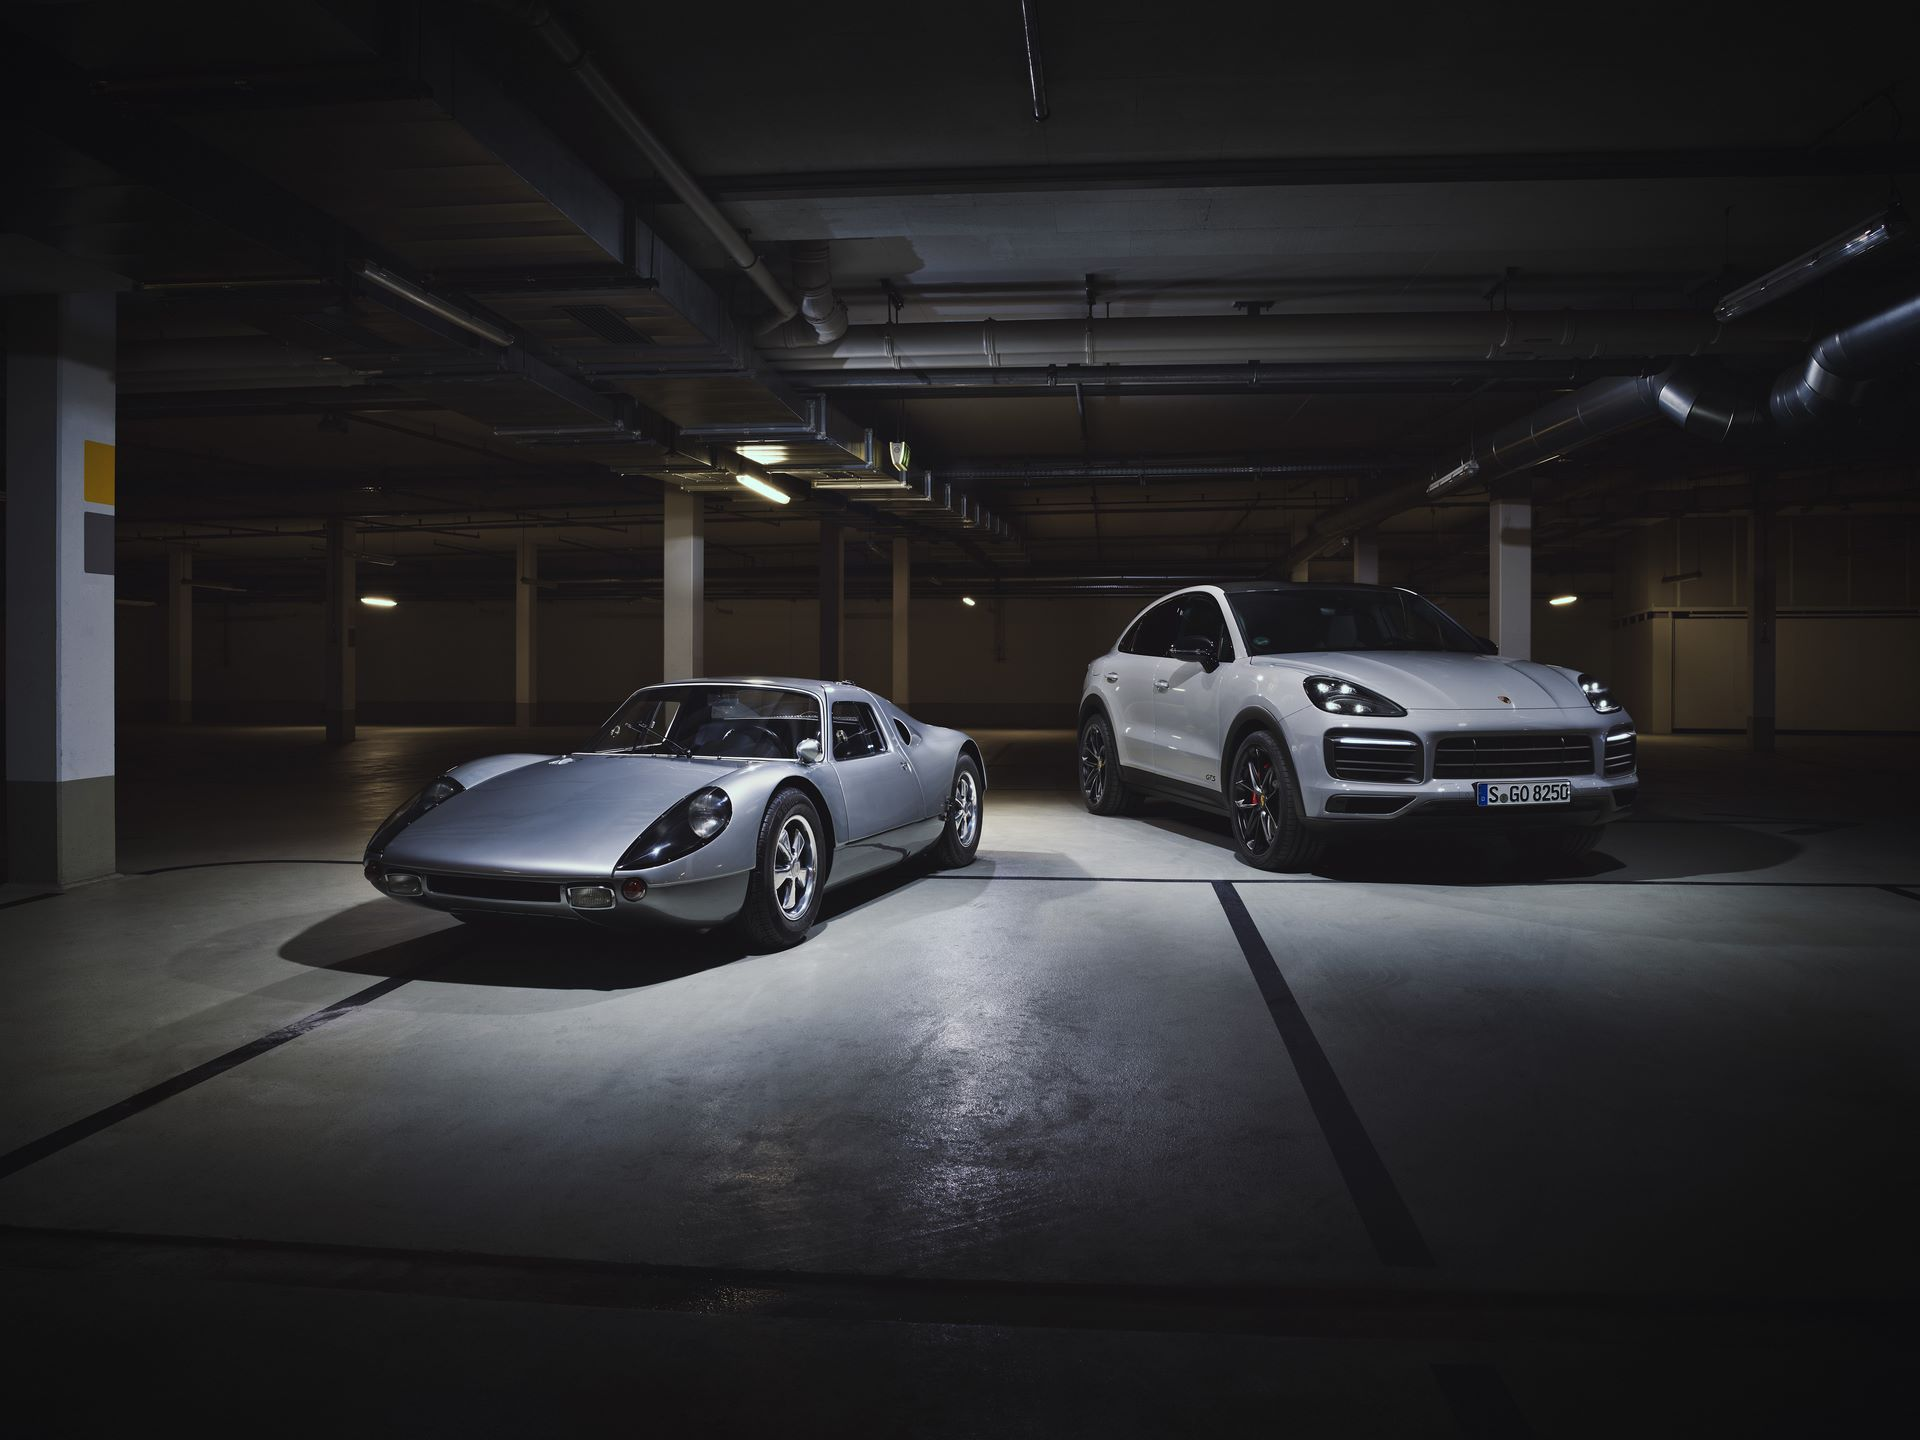 Porsche-Cayenne-GTS-and-Cayenne-GTS-Coupe-2021-8